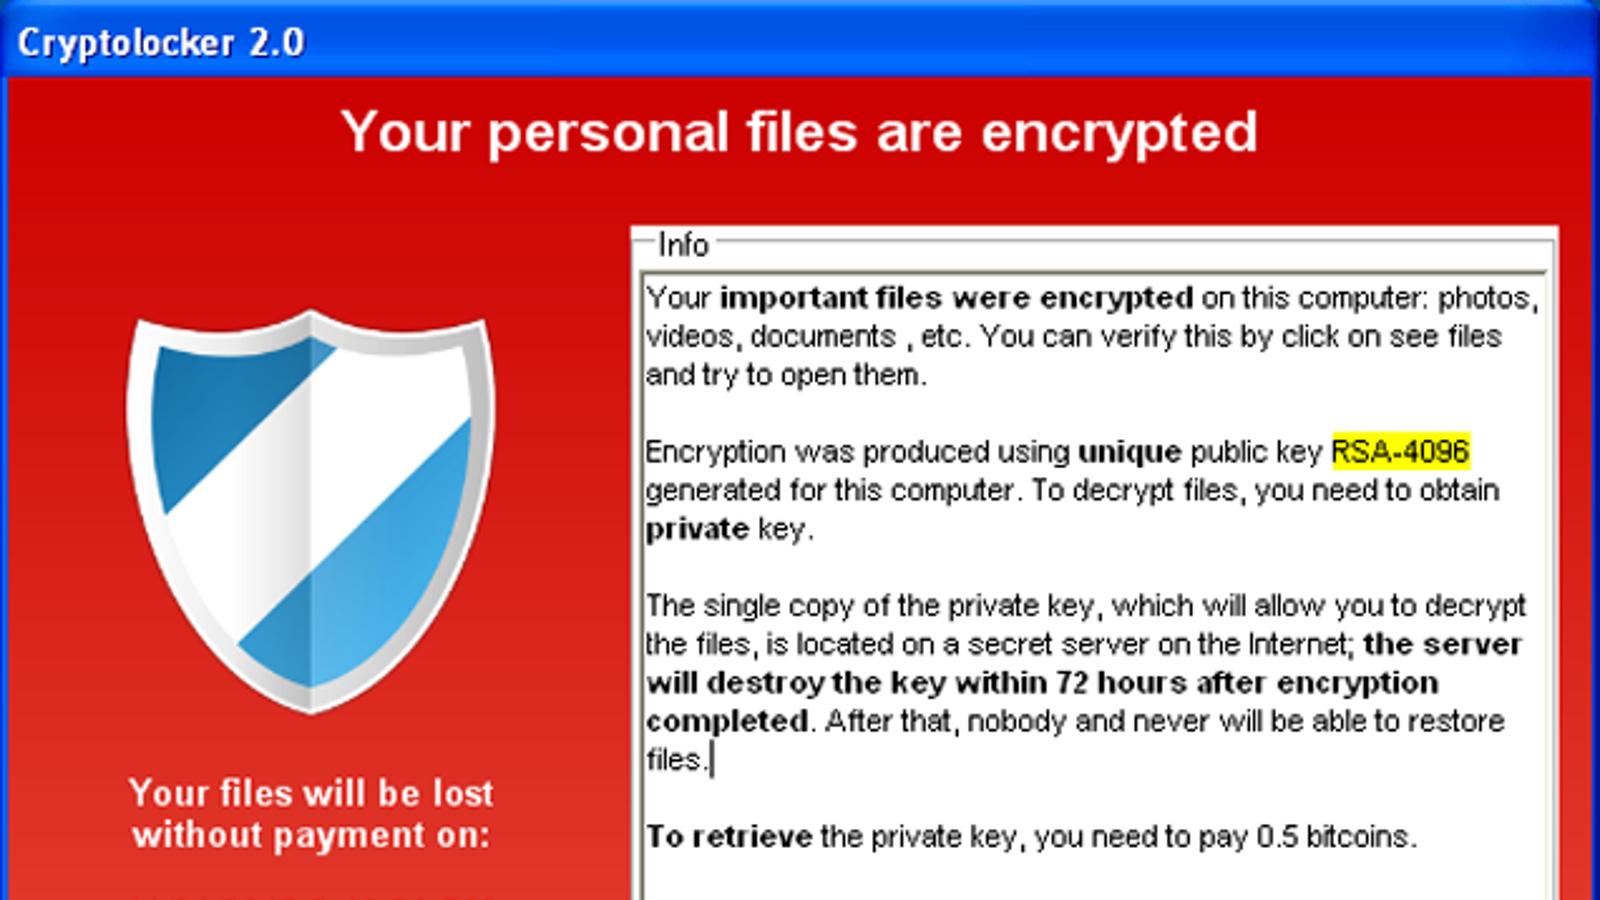 decryptolocker saves you from the popular cryptolocker ransomware